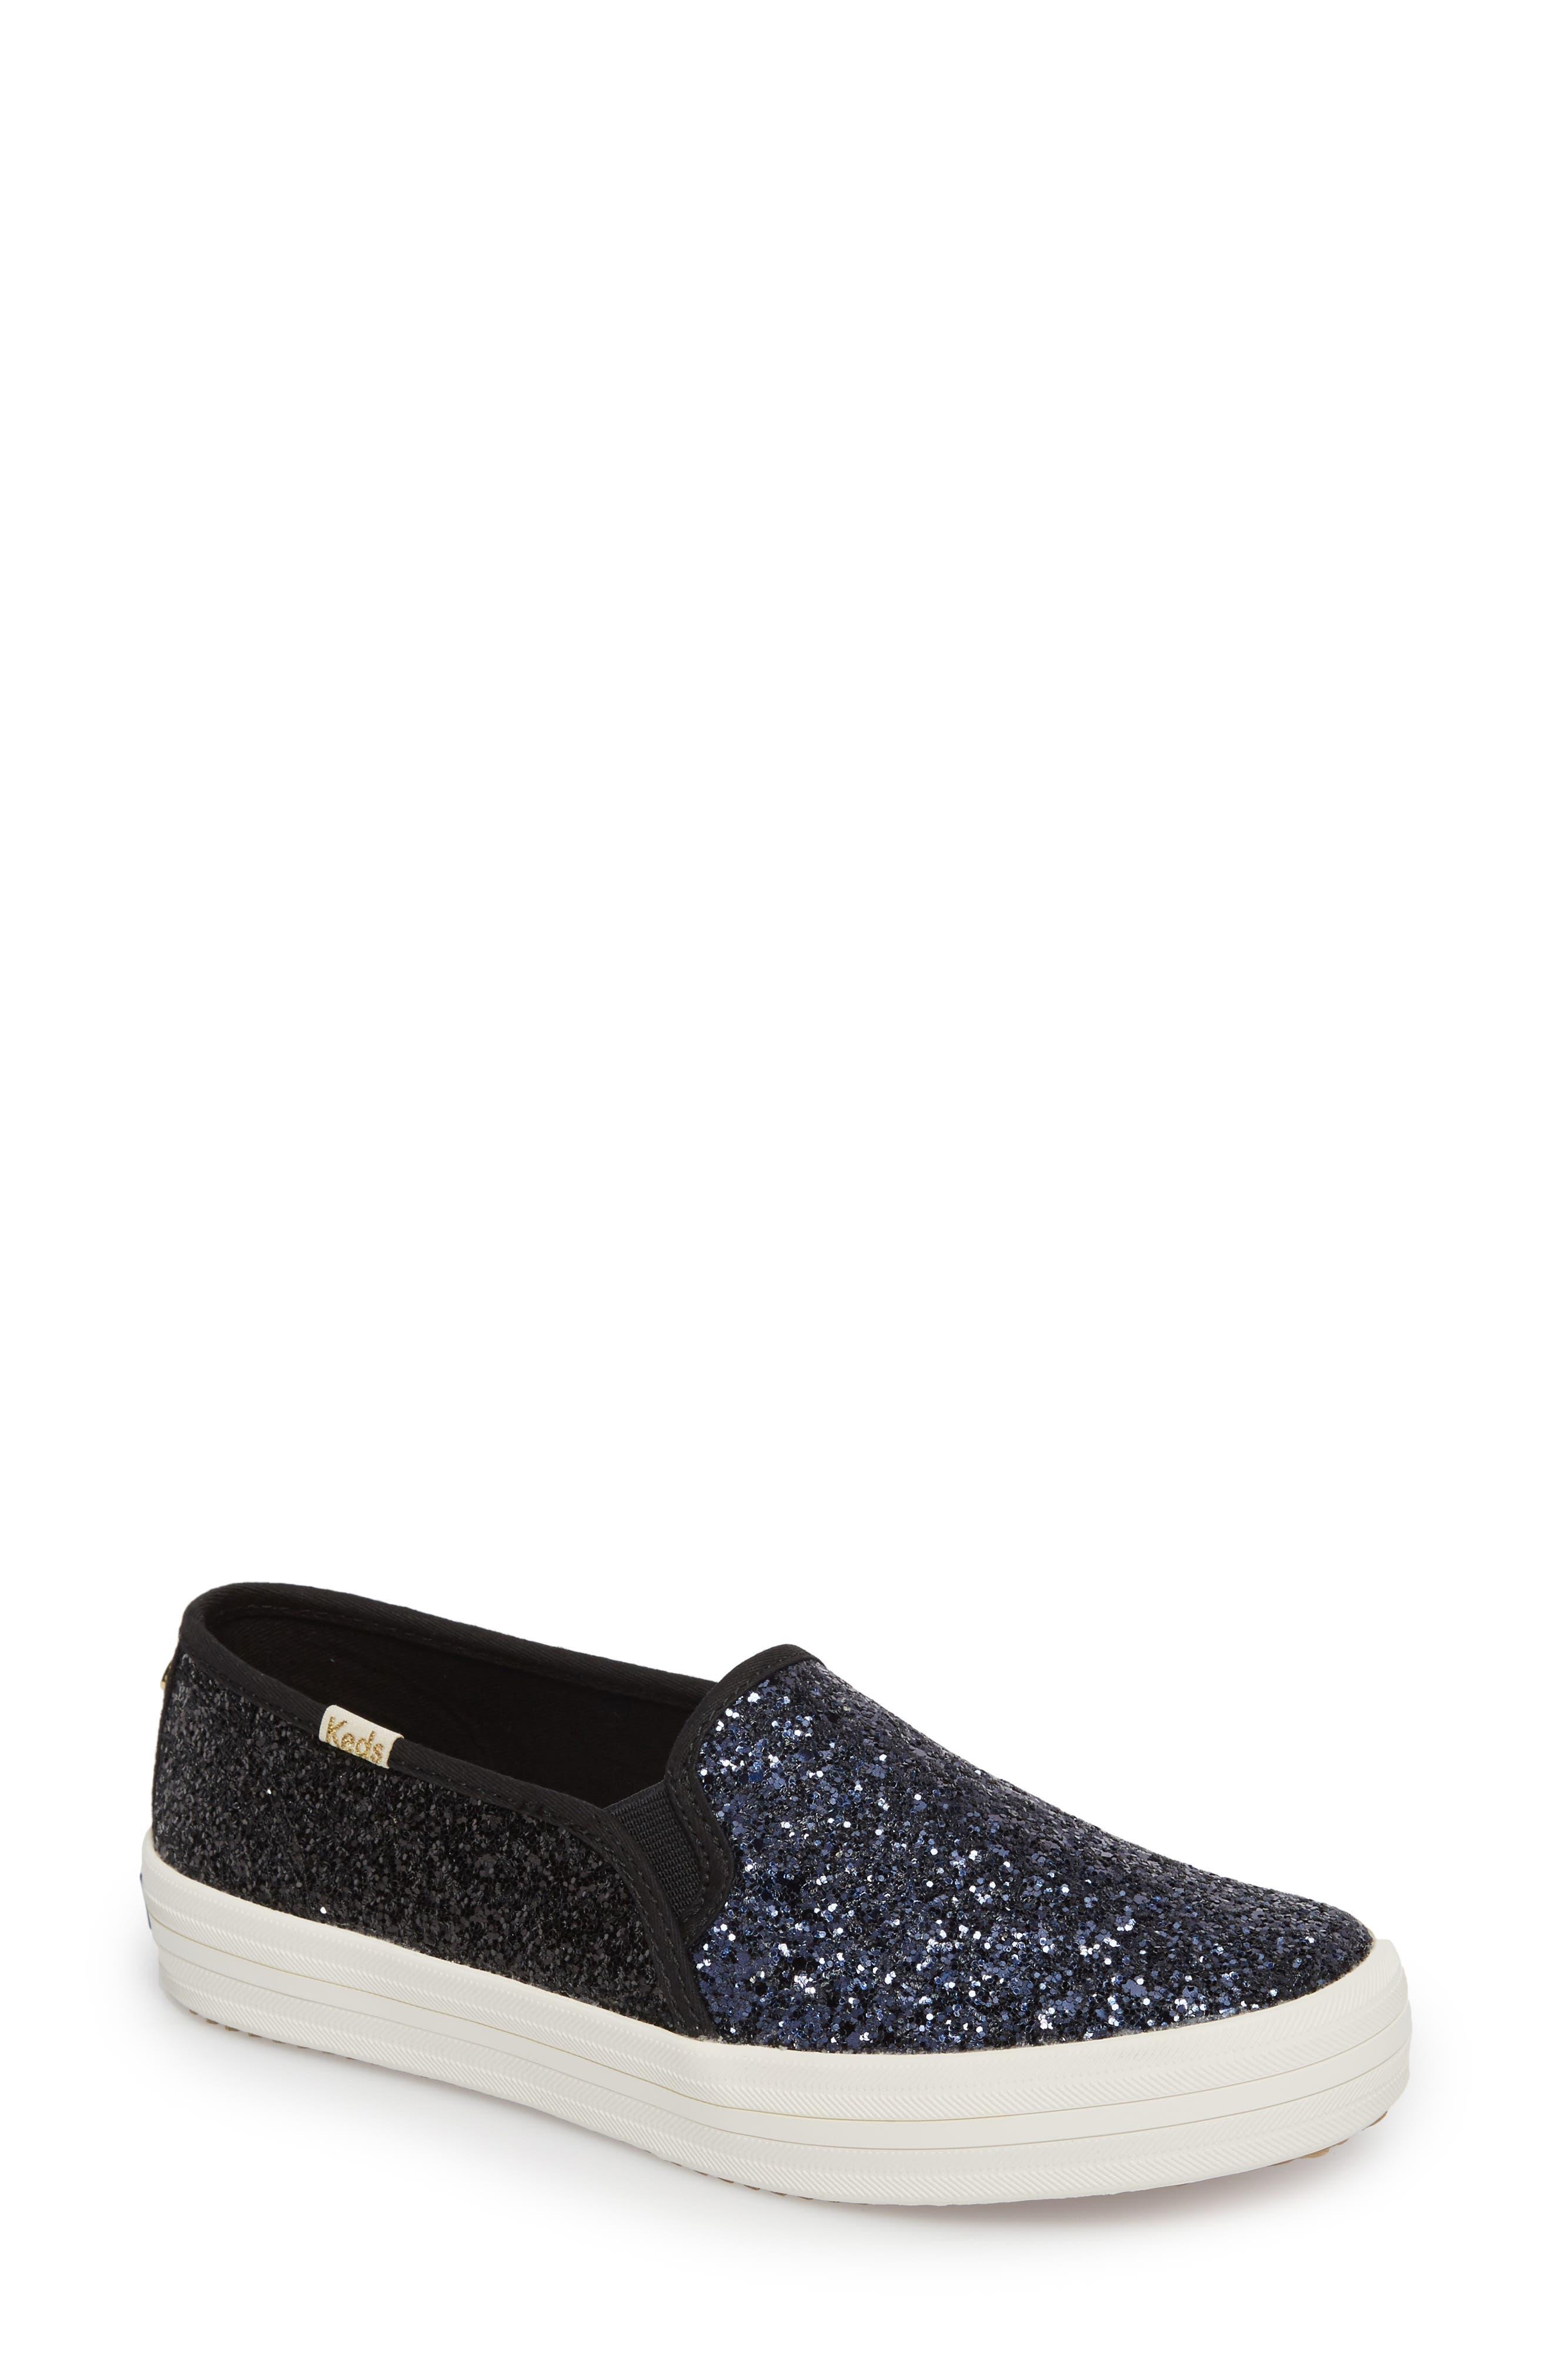 double decker glitter slip-on sneaker,                         Main,                         color, 410